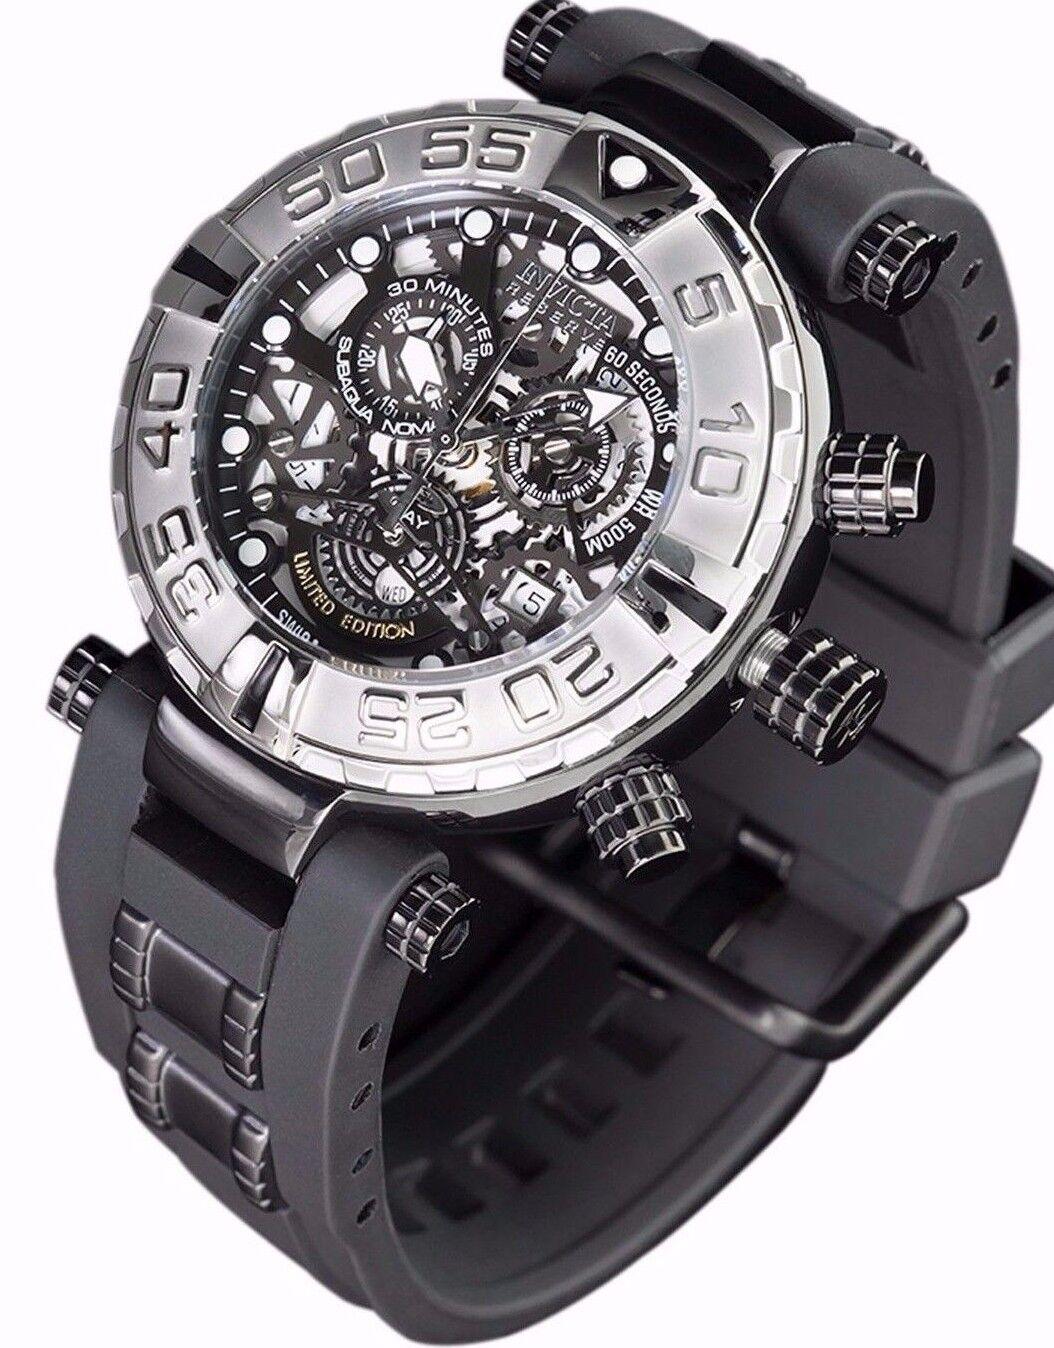 $239.99 - New Mens Invicta Subaqua Swiss Made Chronograph Skeleton Black Dial Watch